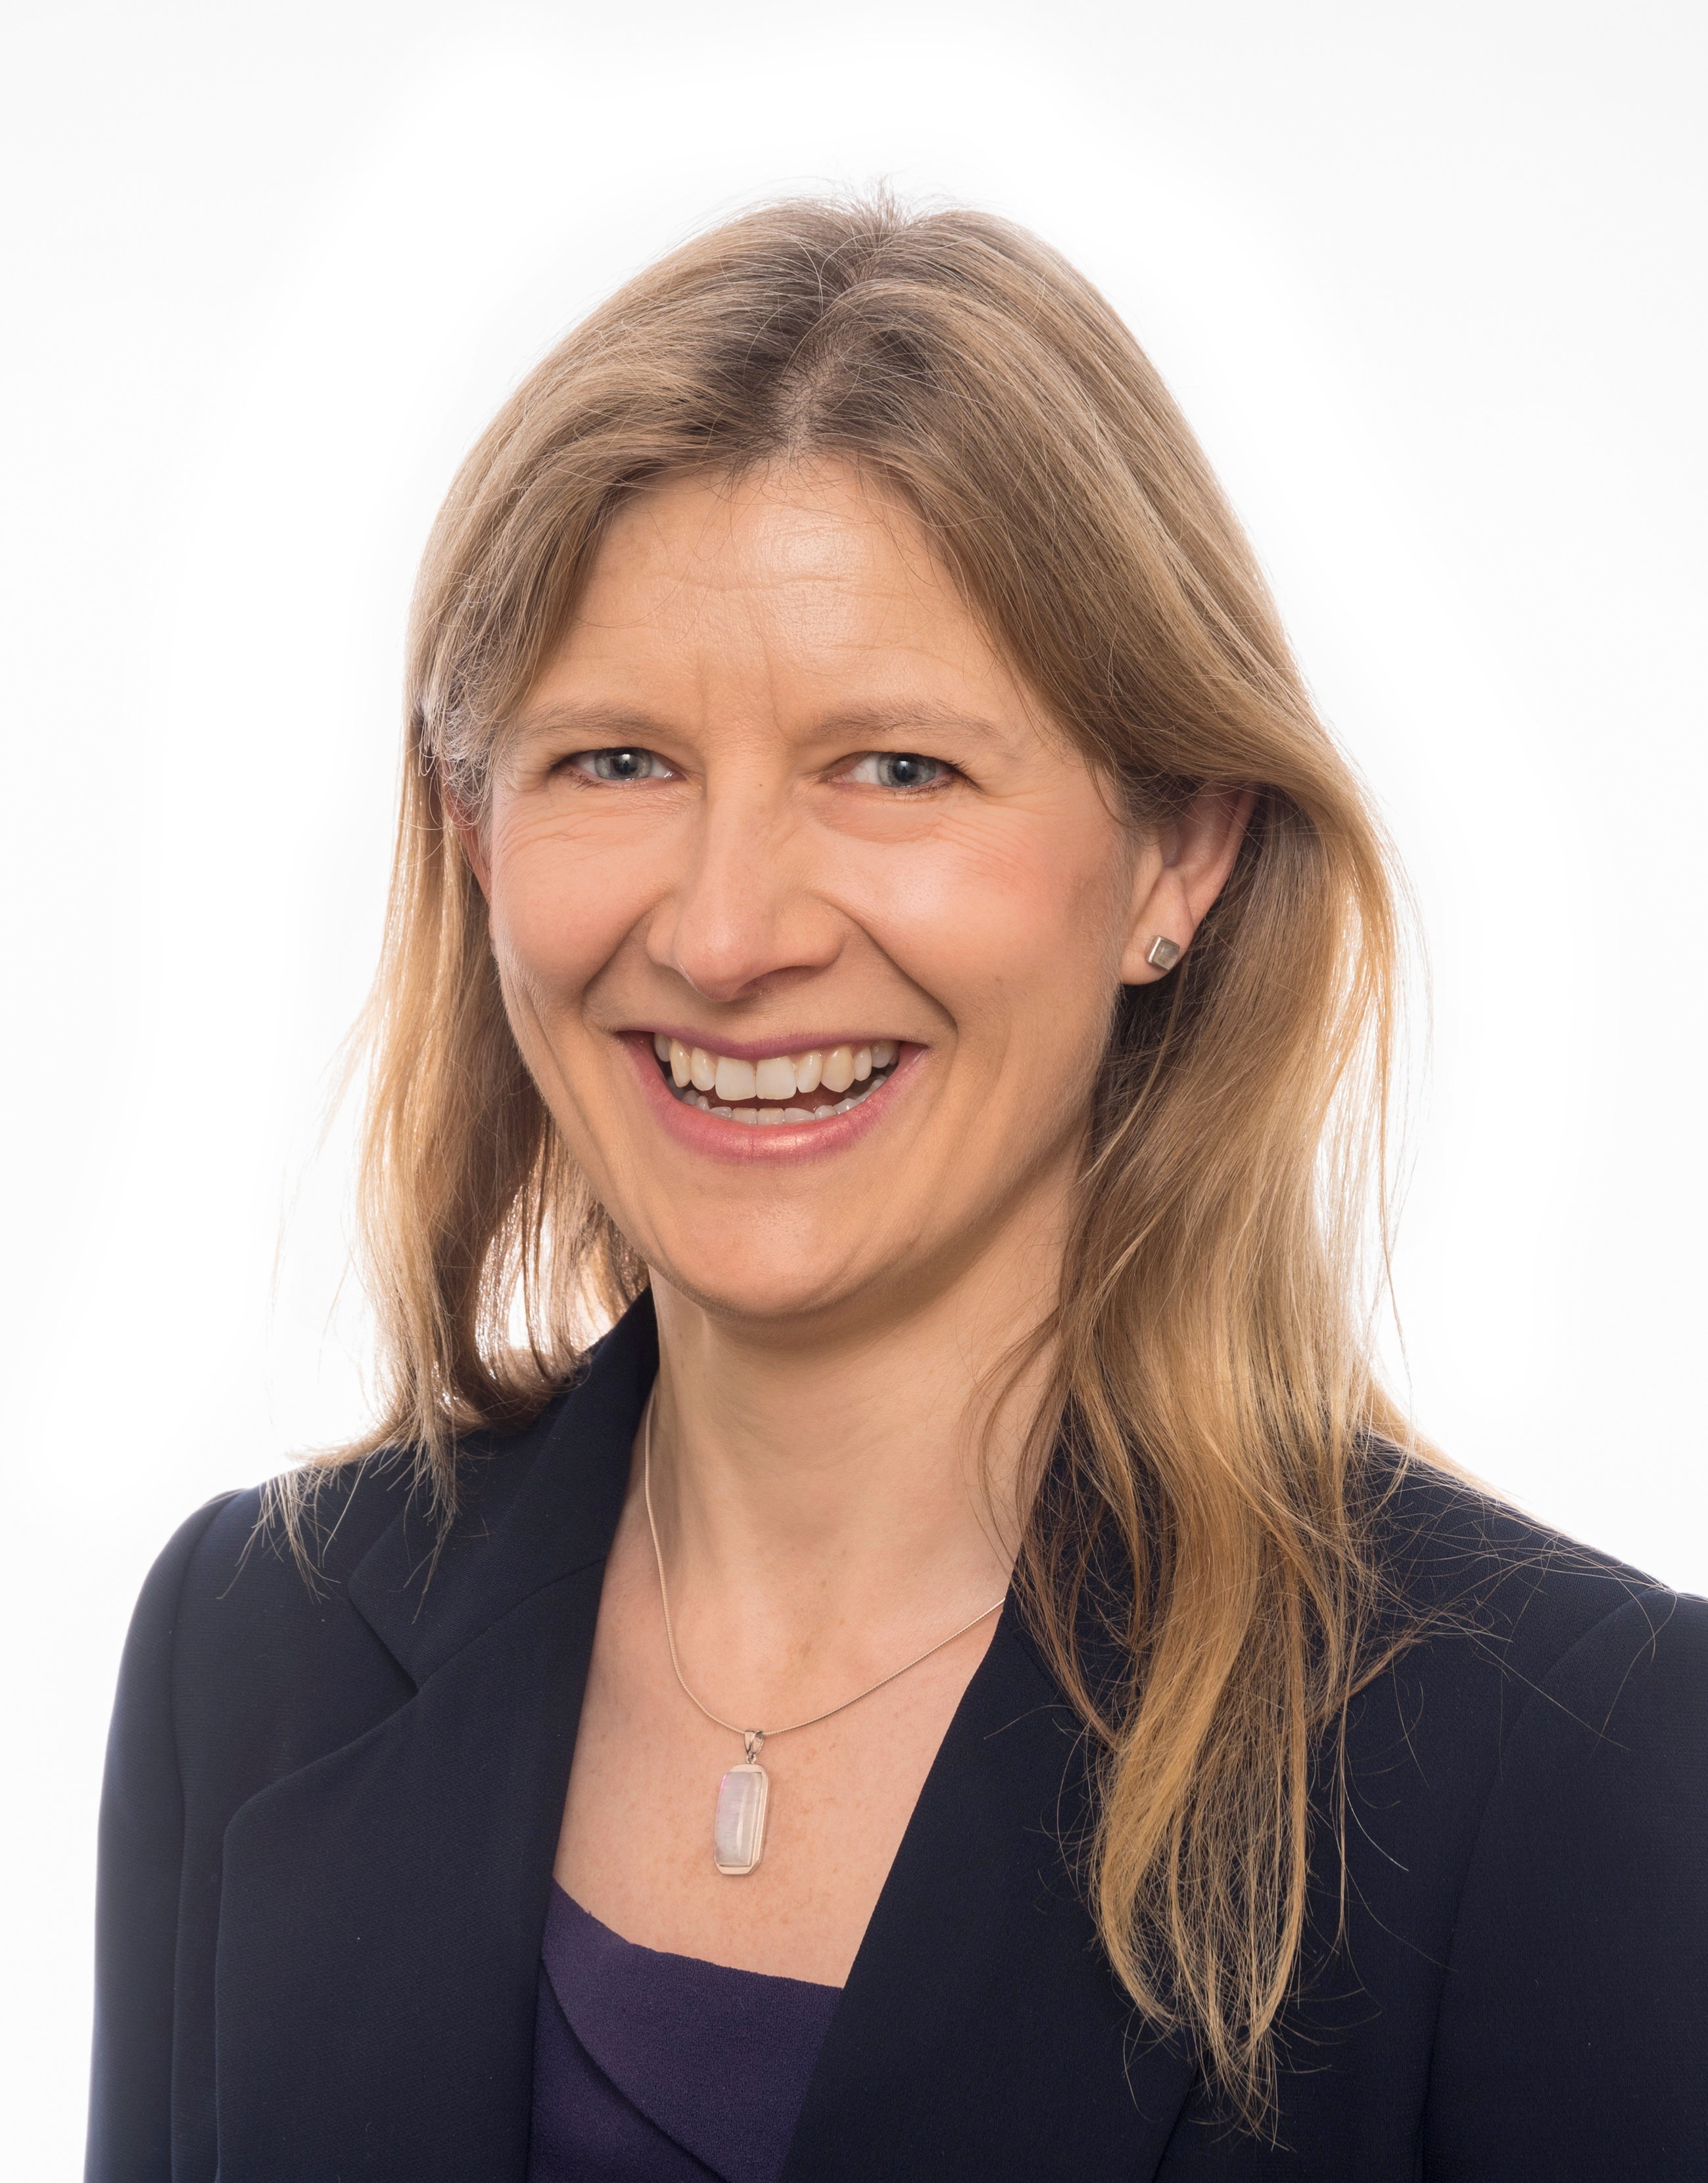 Carol Foussat